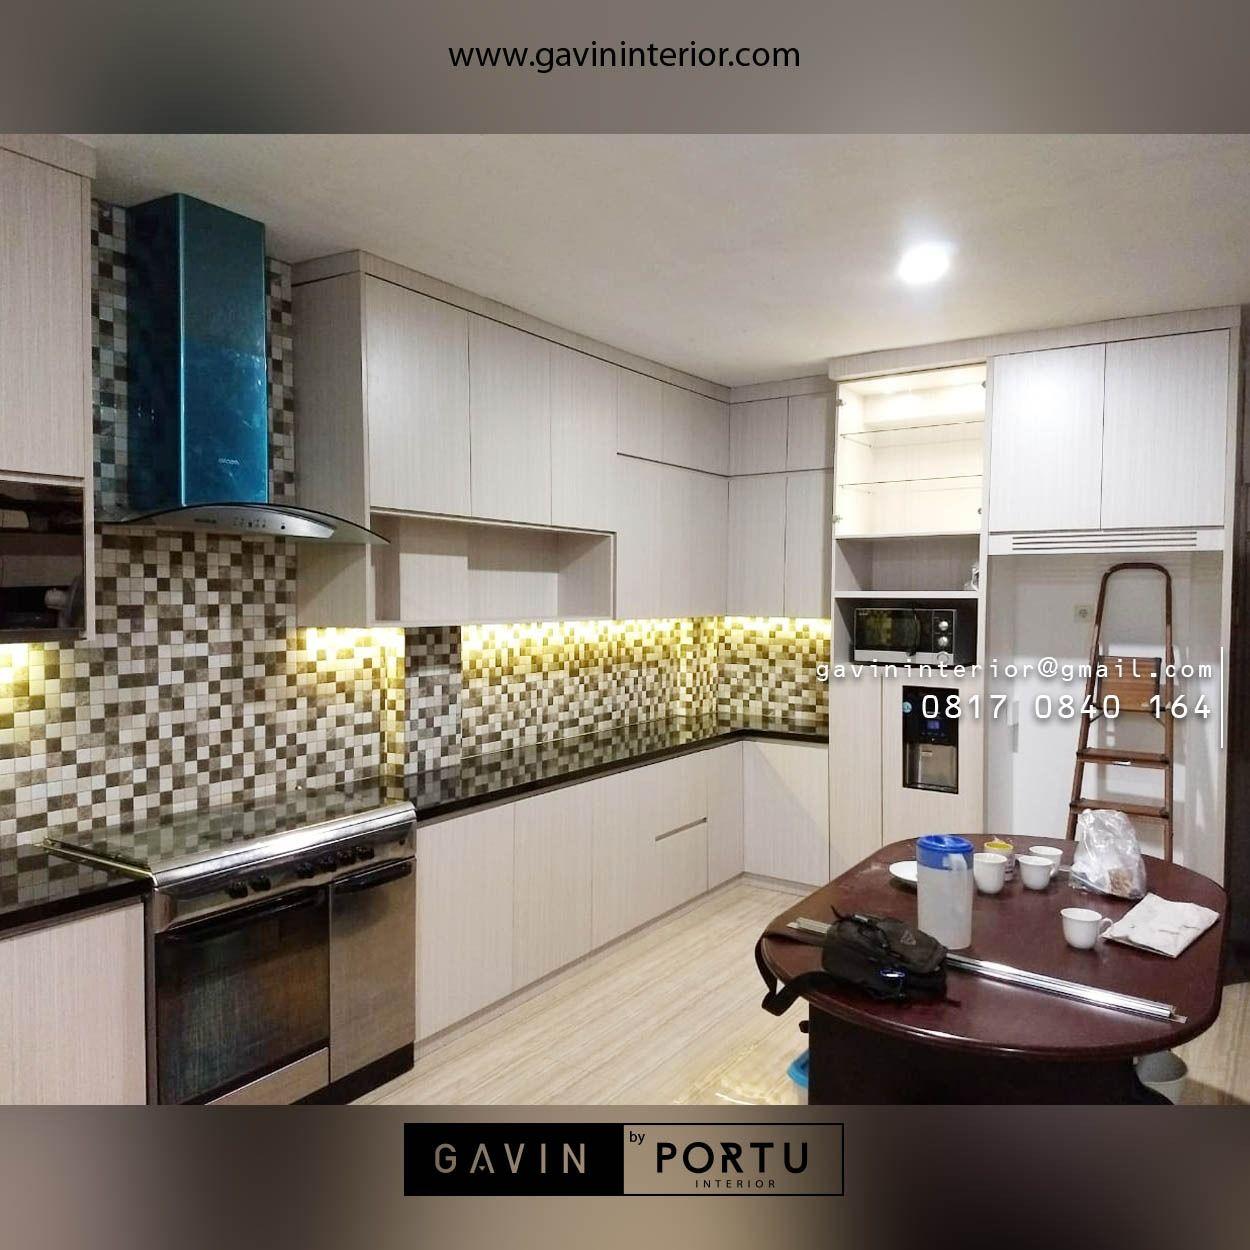 Pin on Beli kitchen set